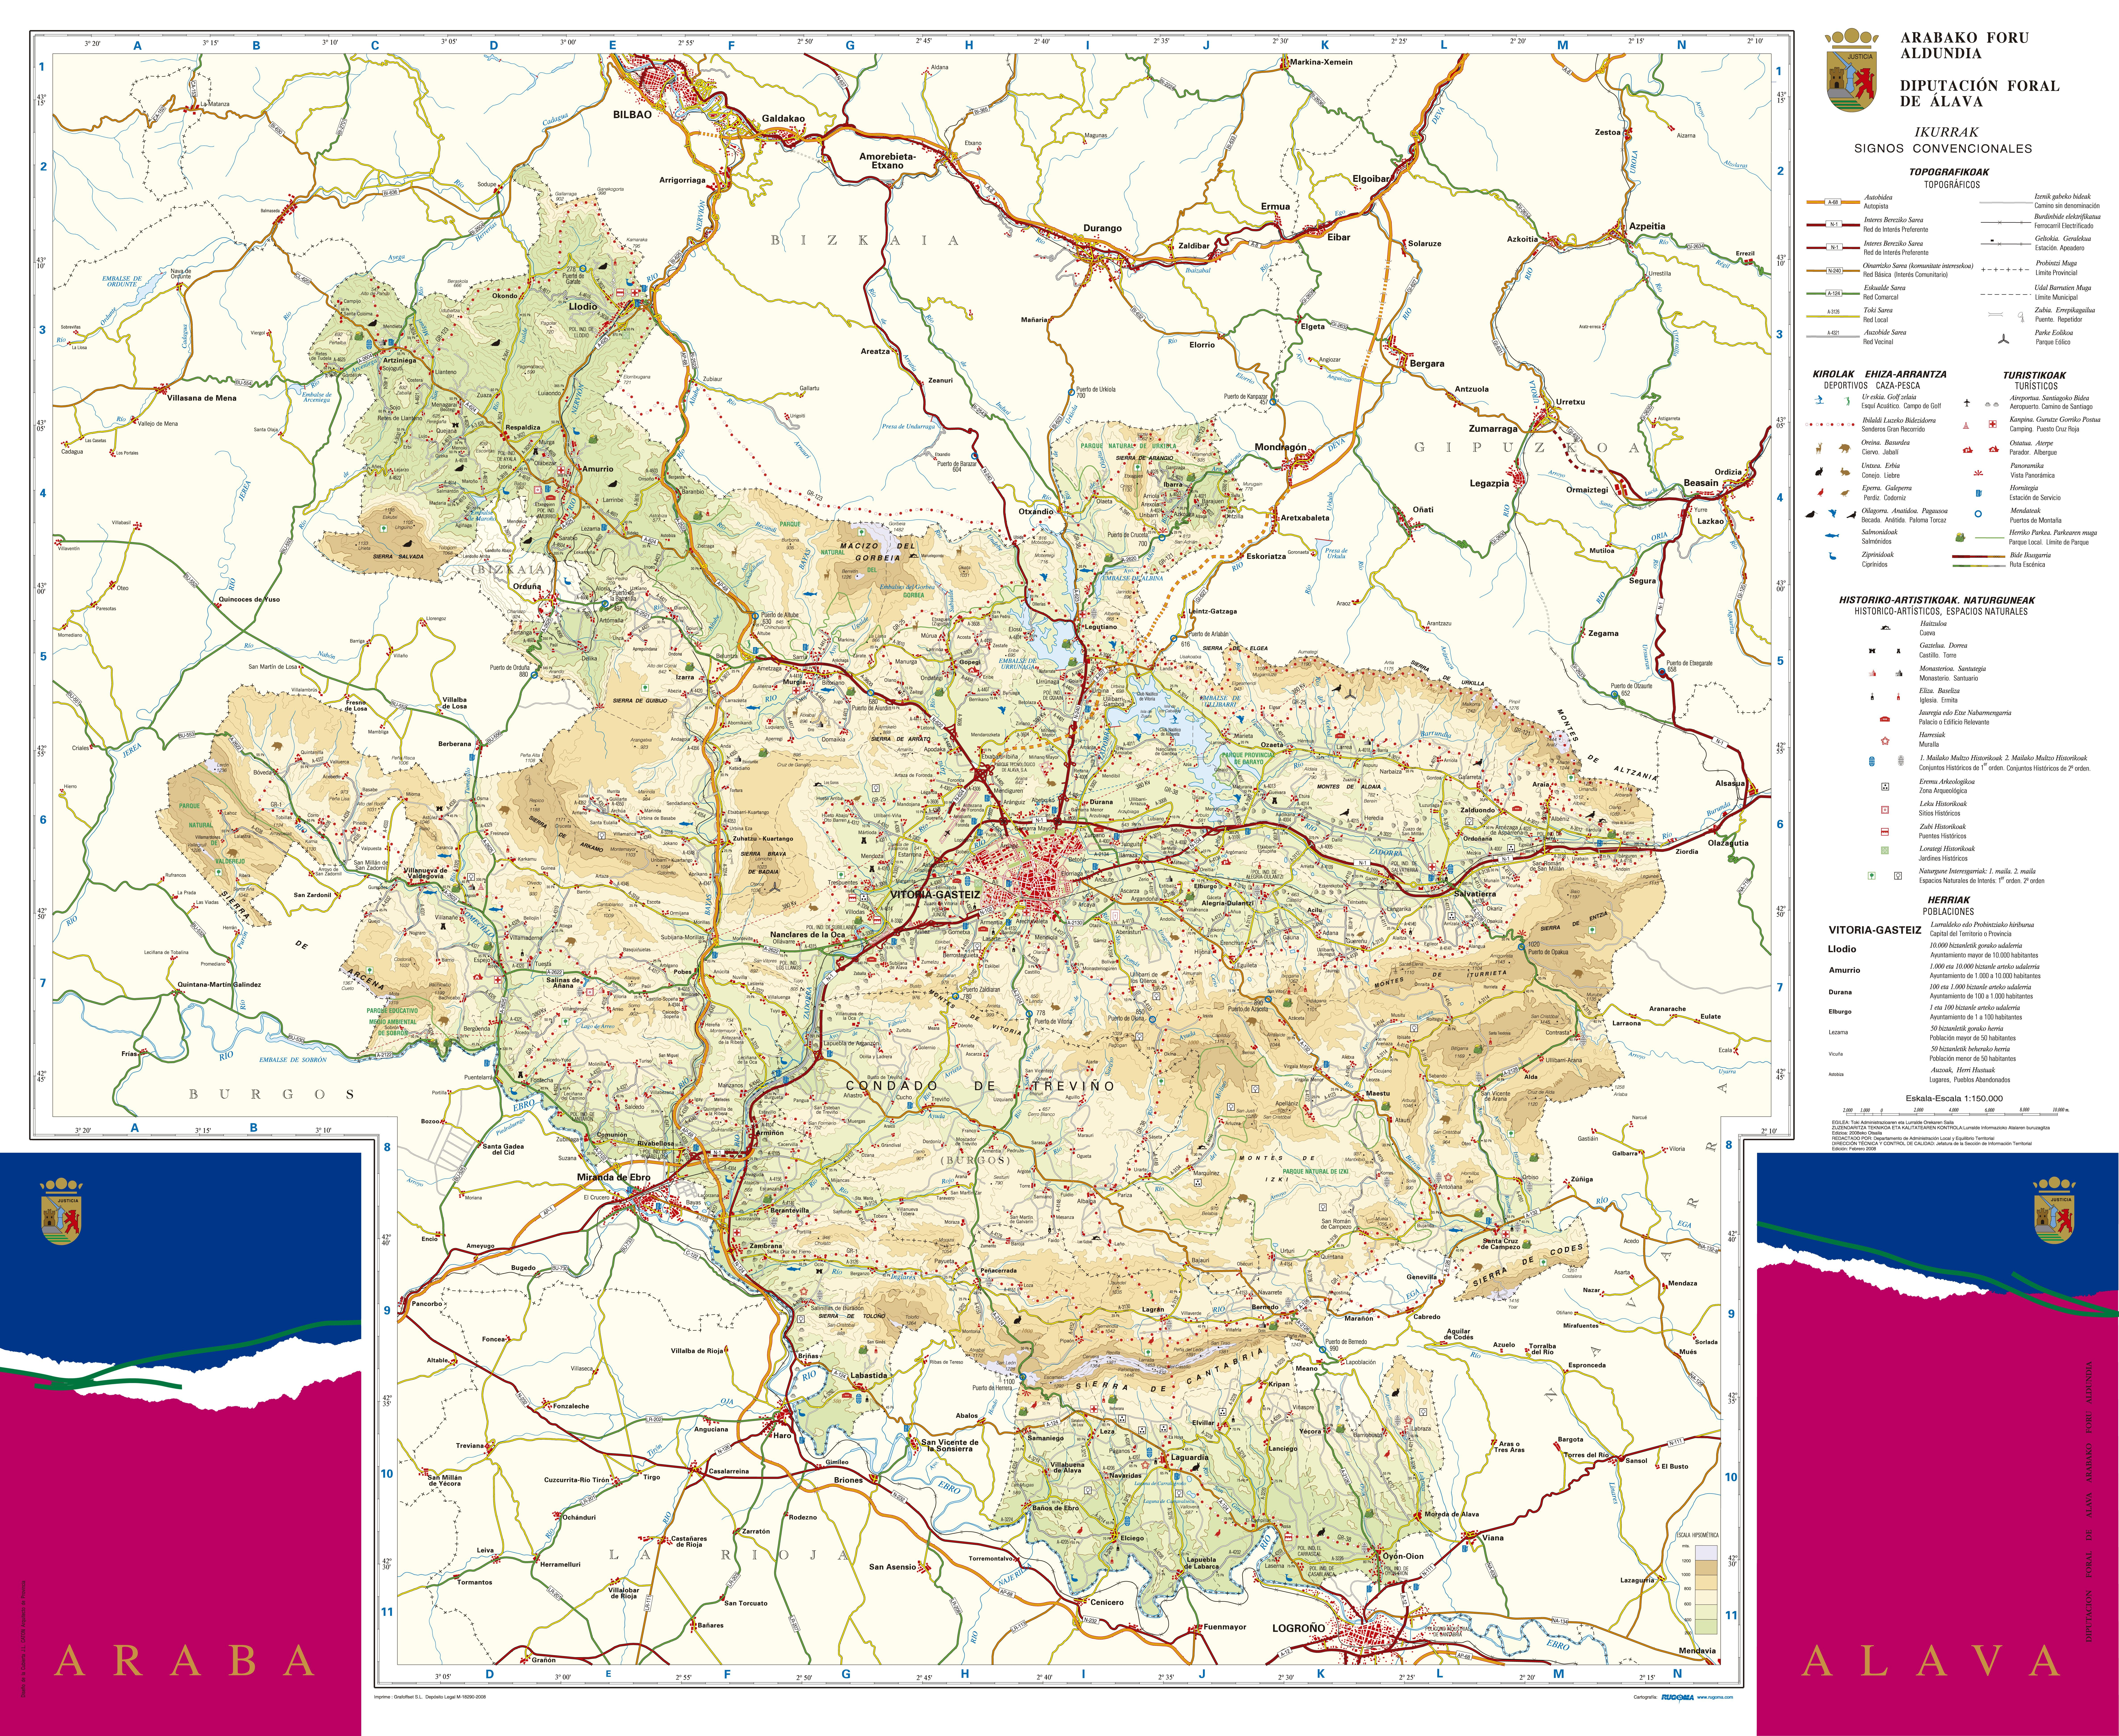 Mapa bet365 finanz bewertung bet365 fußball-wett-tipps Político de España - Tamaño completo